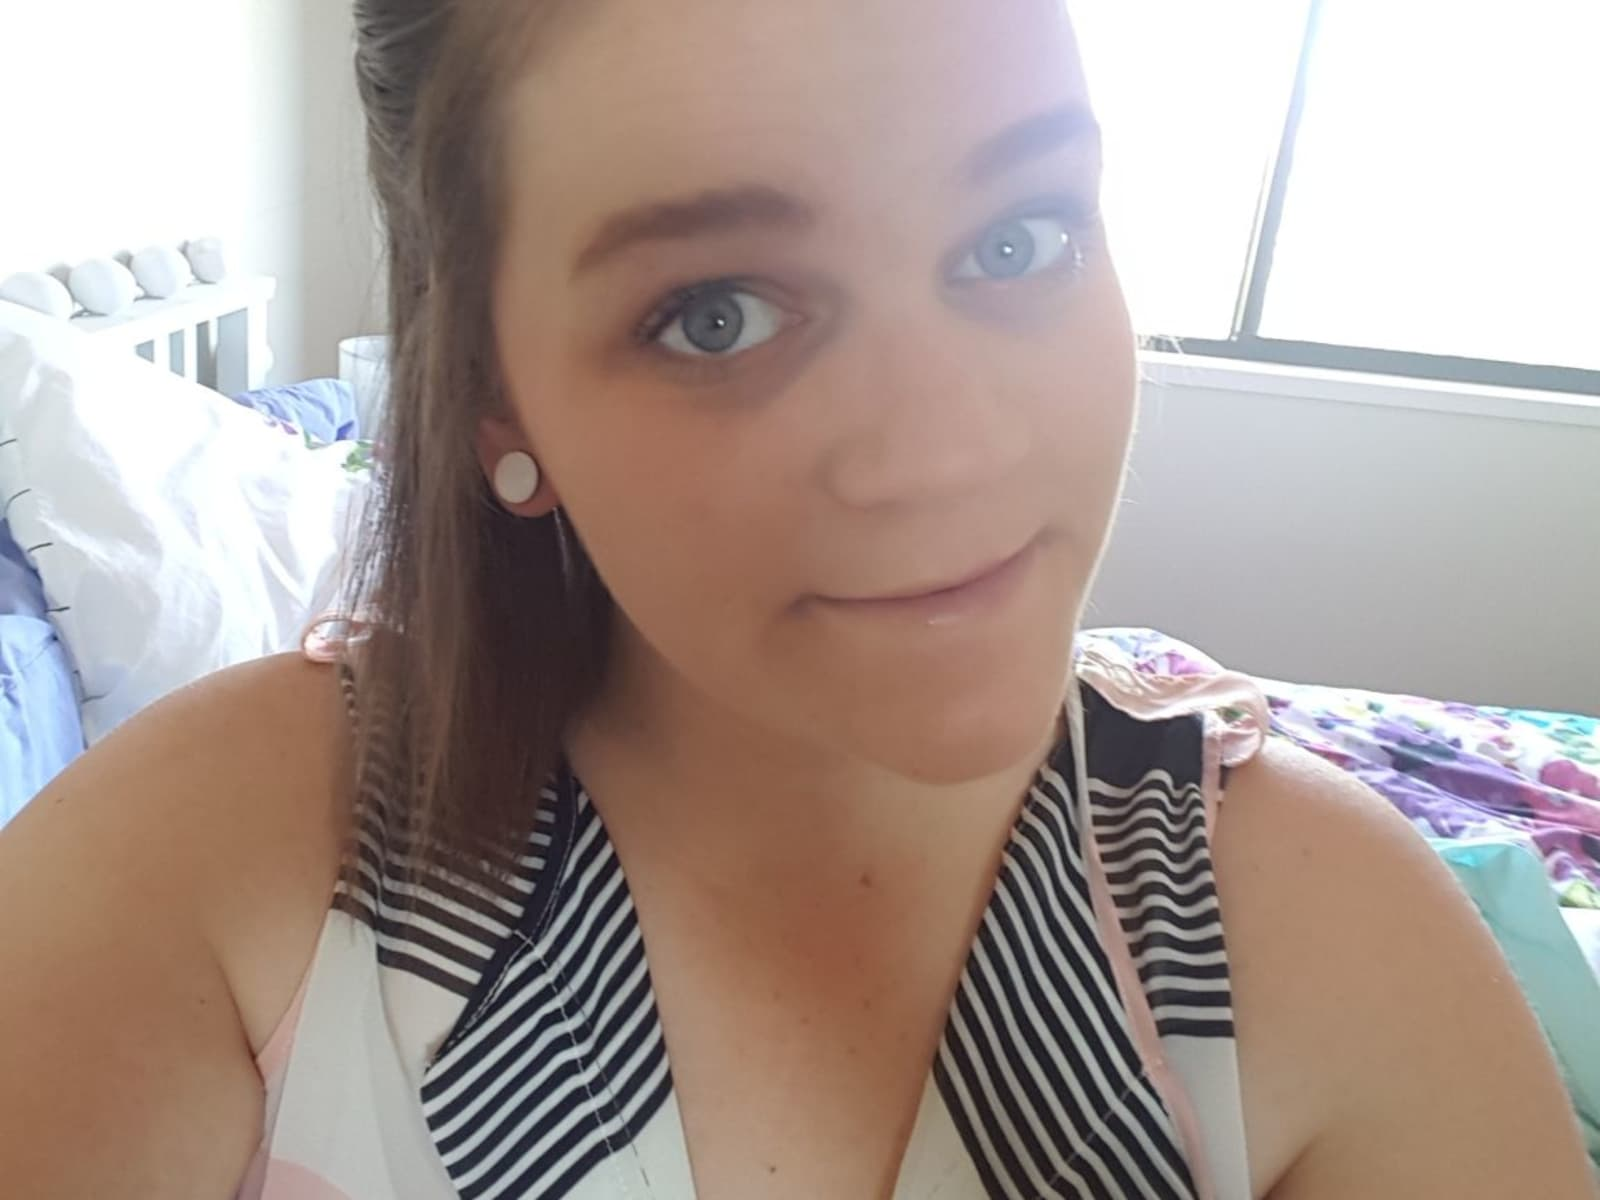 Eliza from Merimbula, New South Wales, Australia